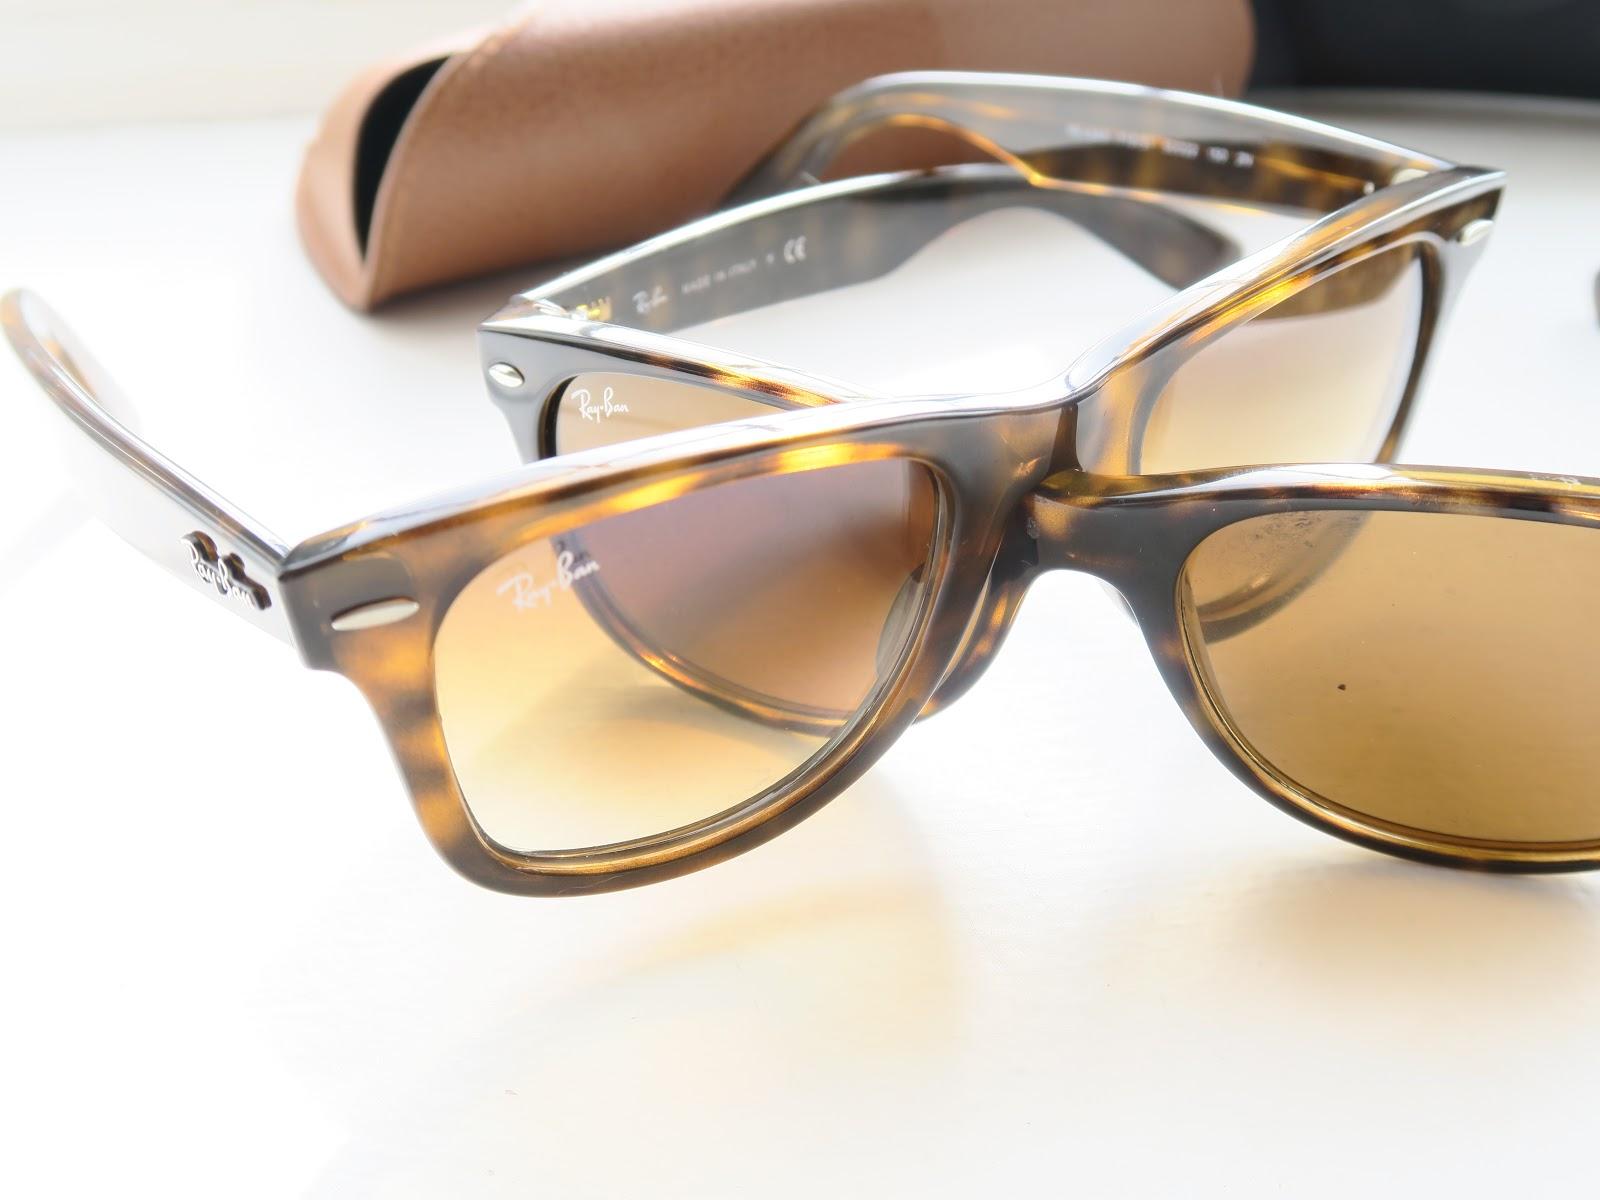 Fashion Blog: How To Spot FAKE Ray-Ban Sunglasses - Hello, Terri Lowe